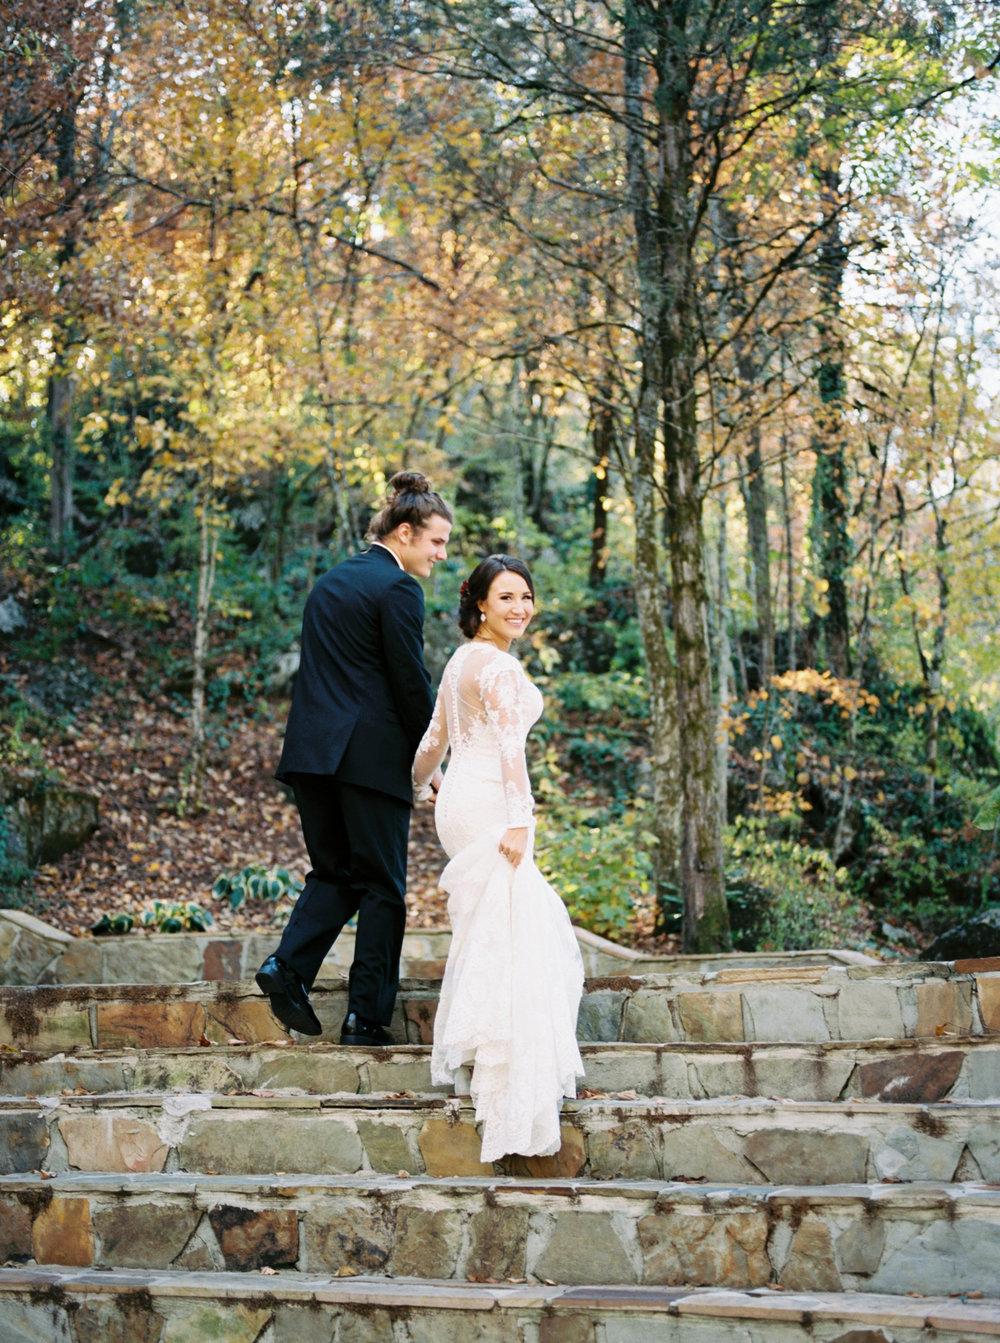 katie_Jordan_Daras_Garden_Wedding_Abigail_Malone_Photography-1133.jpg